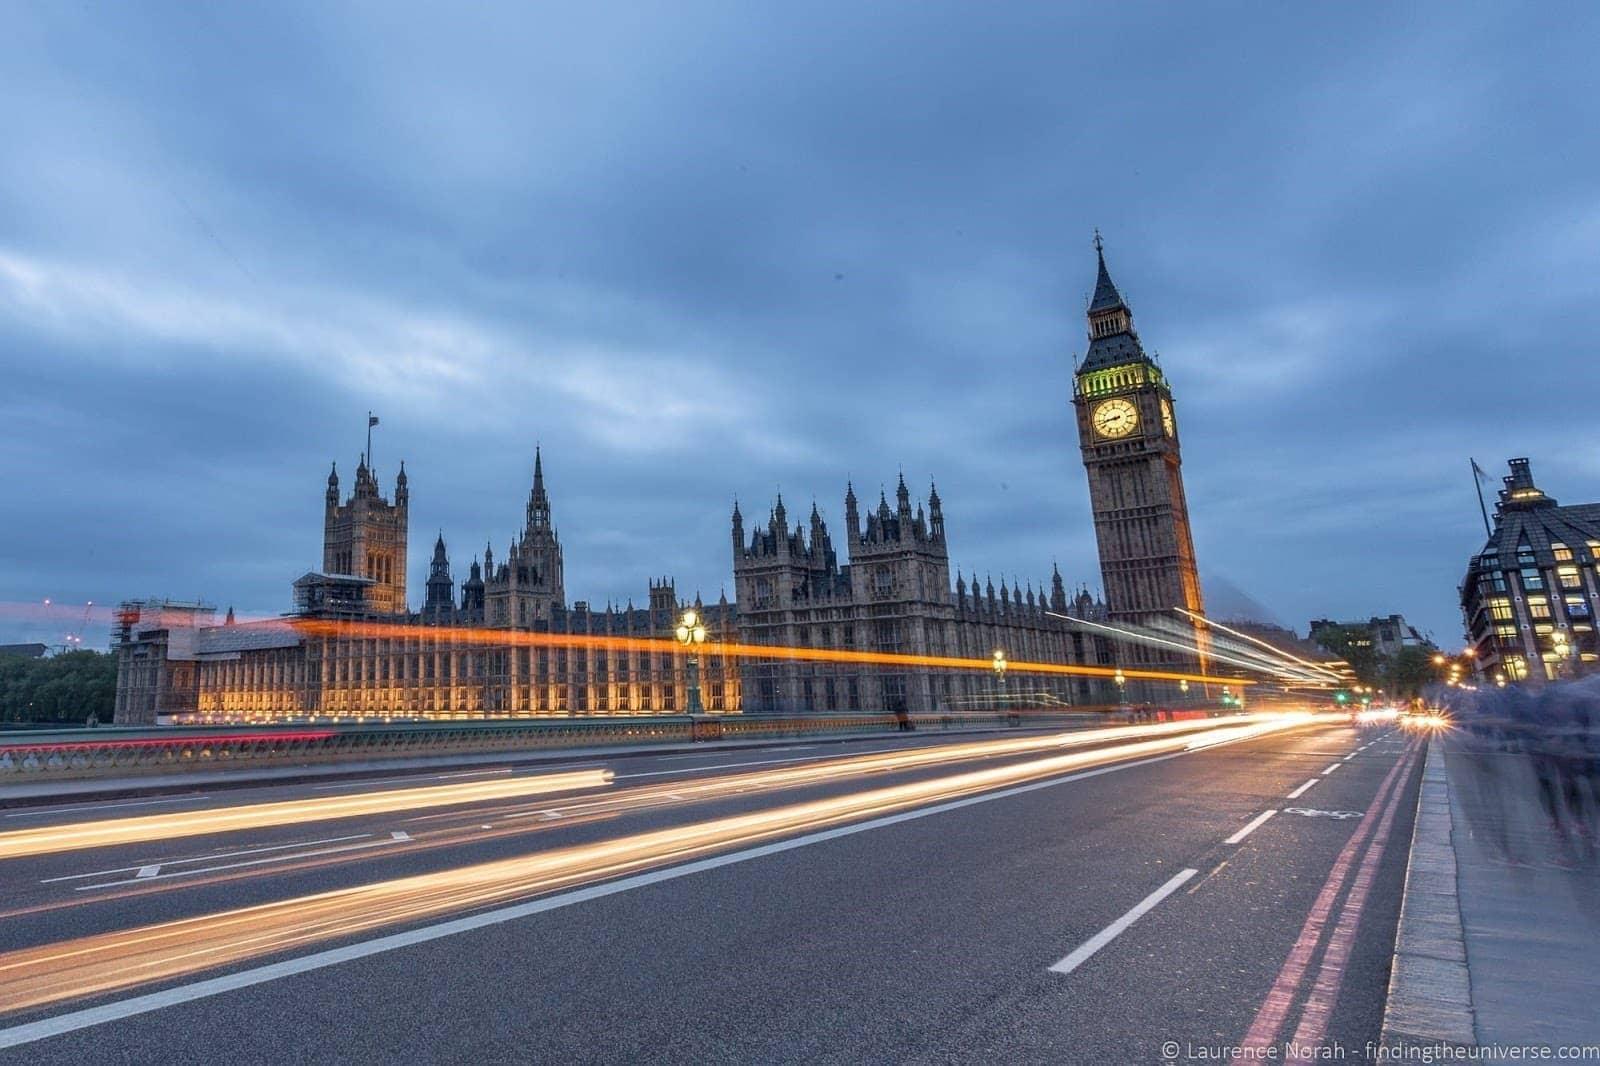 blog Λονδίνο dating δωρεάν ιστοσελίδες γνωριμιών στη Βόρεια Καρολίνα